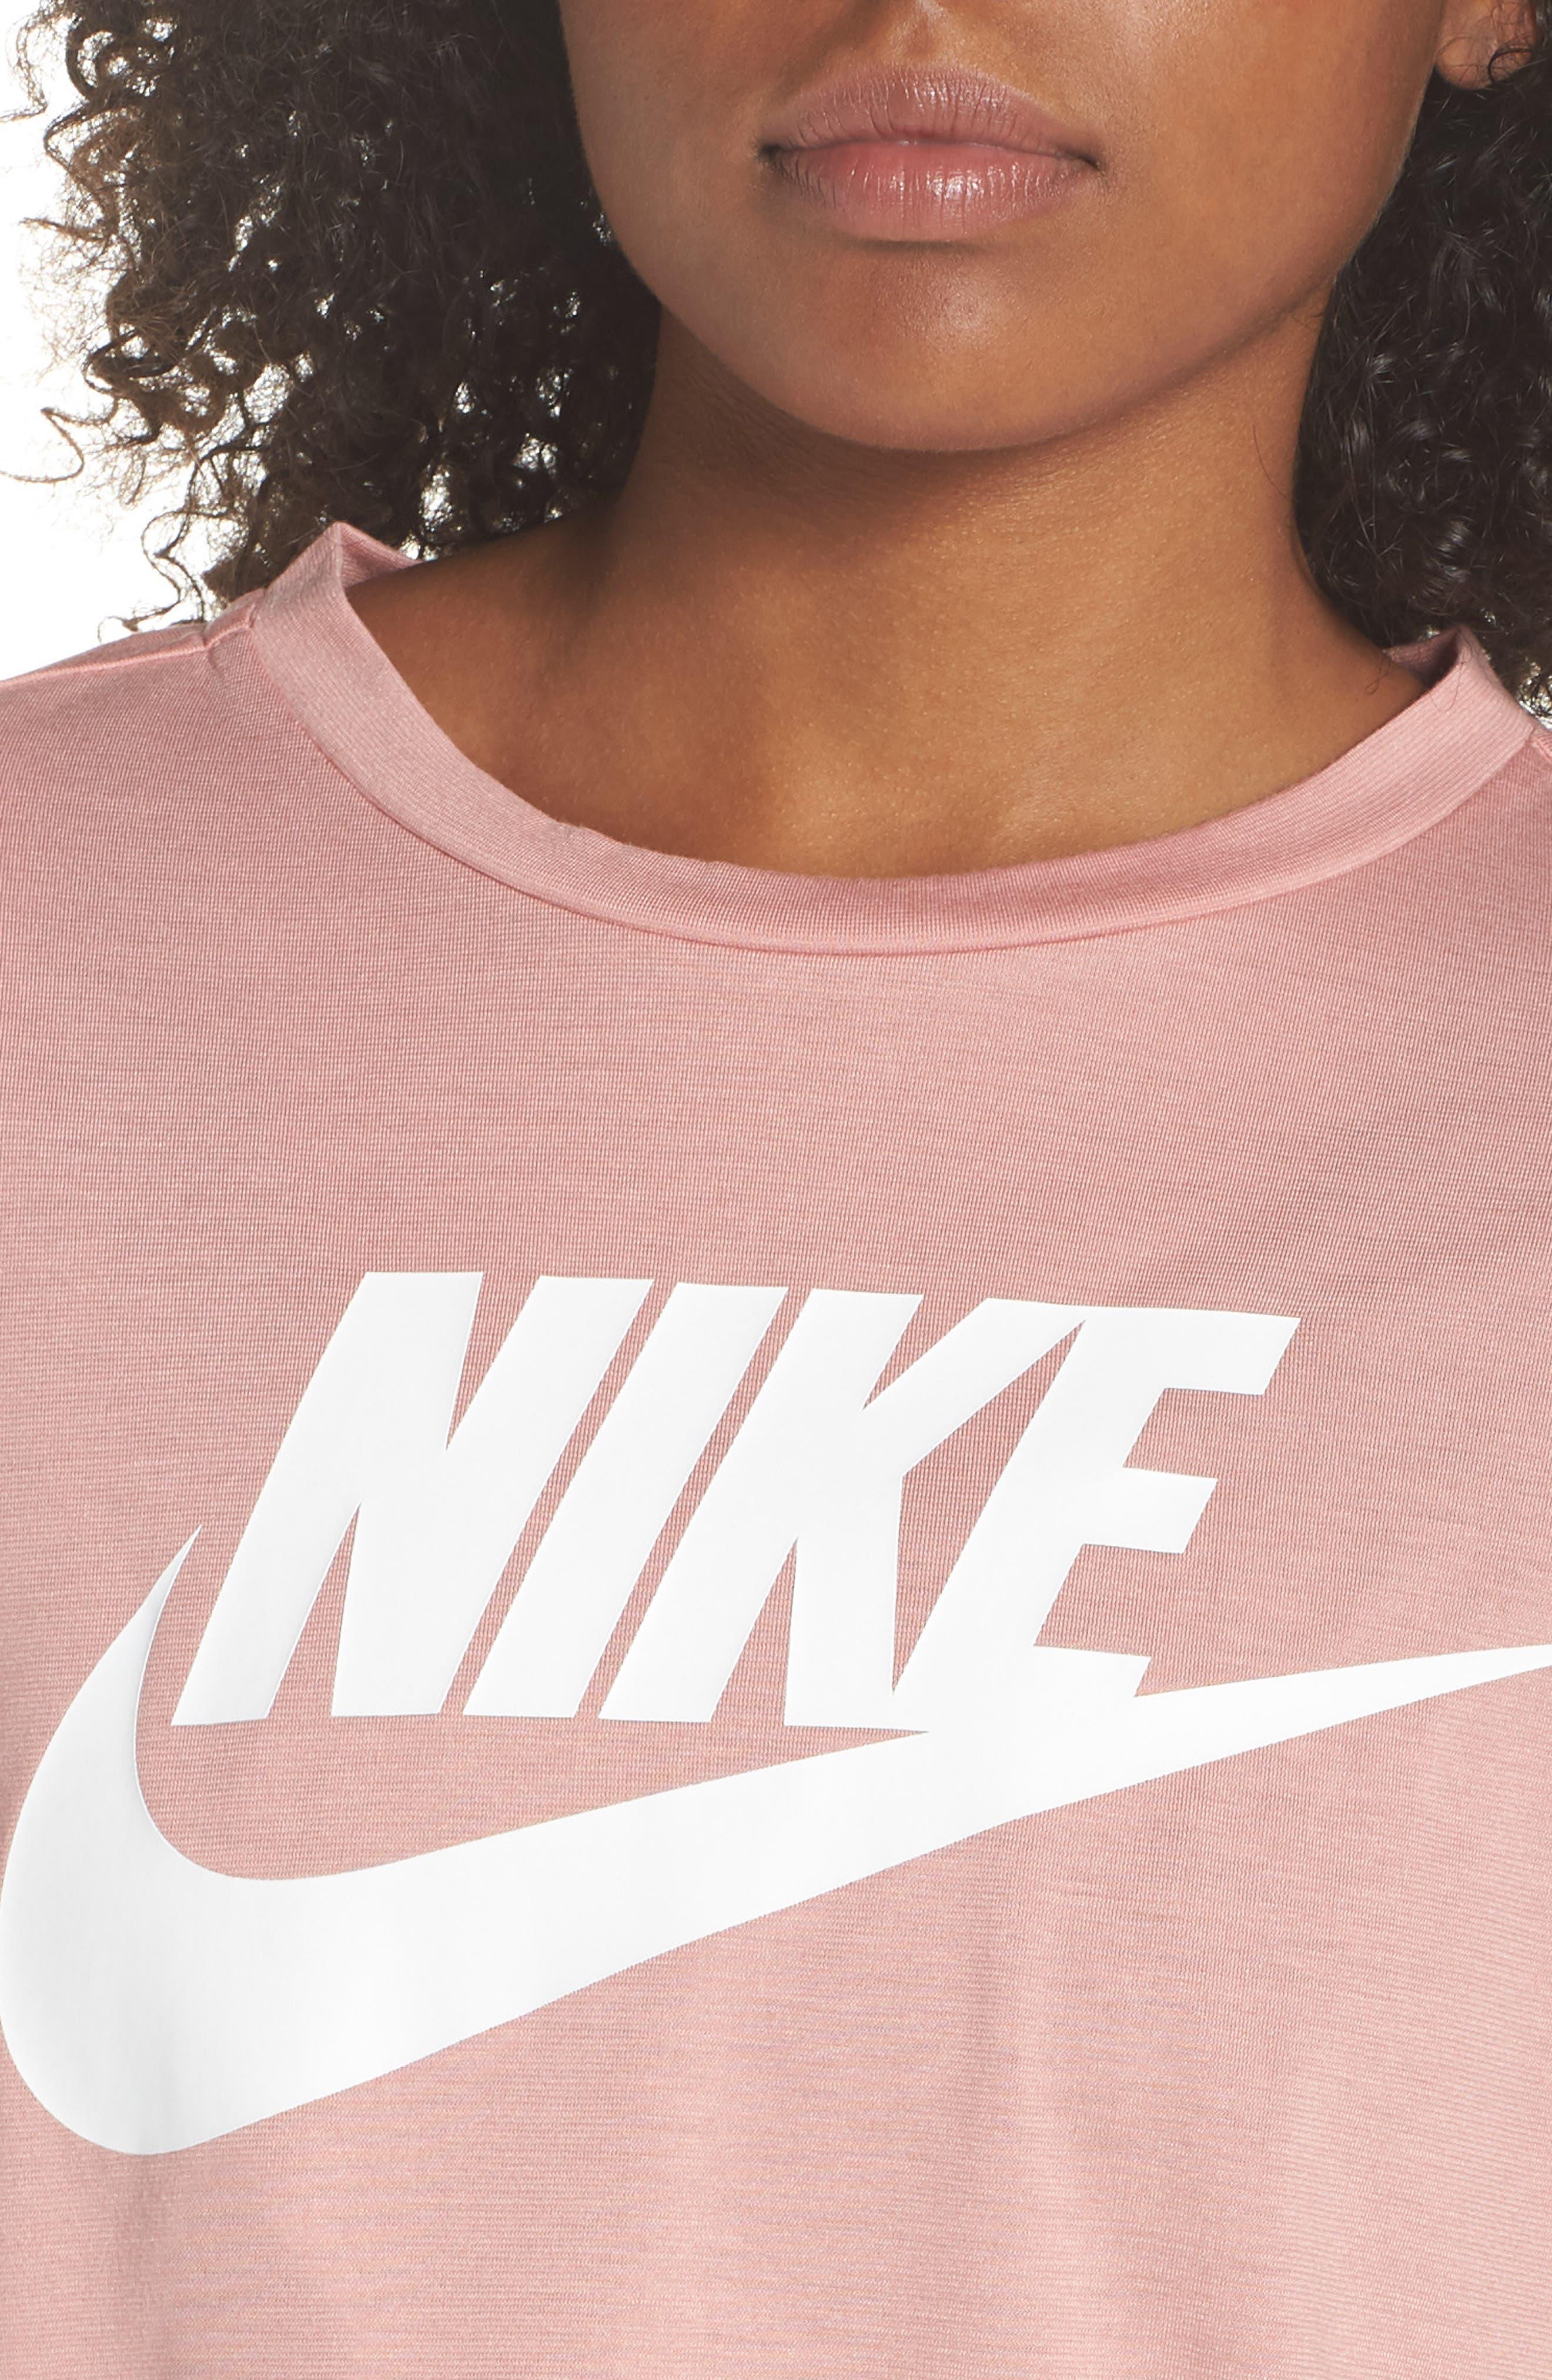 Sportswear Crop Top,                             Alternate thumbnail 4, color,                             Rust Pink/ White